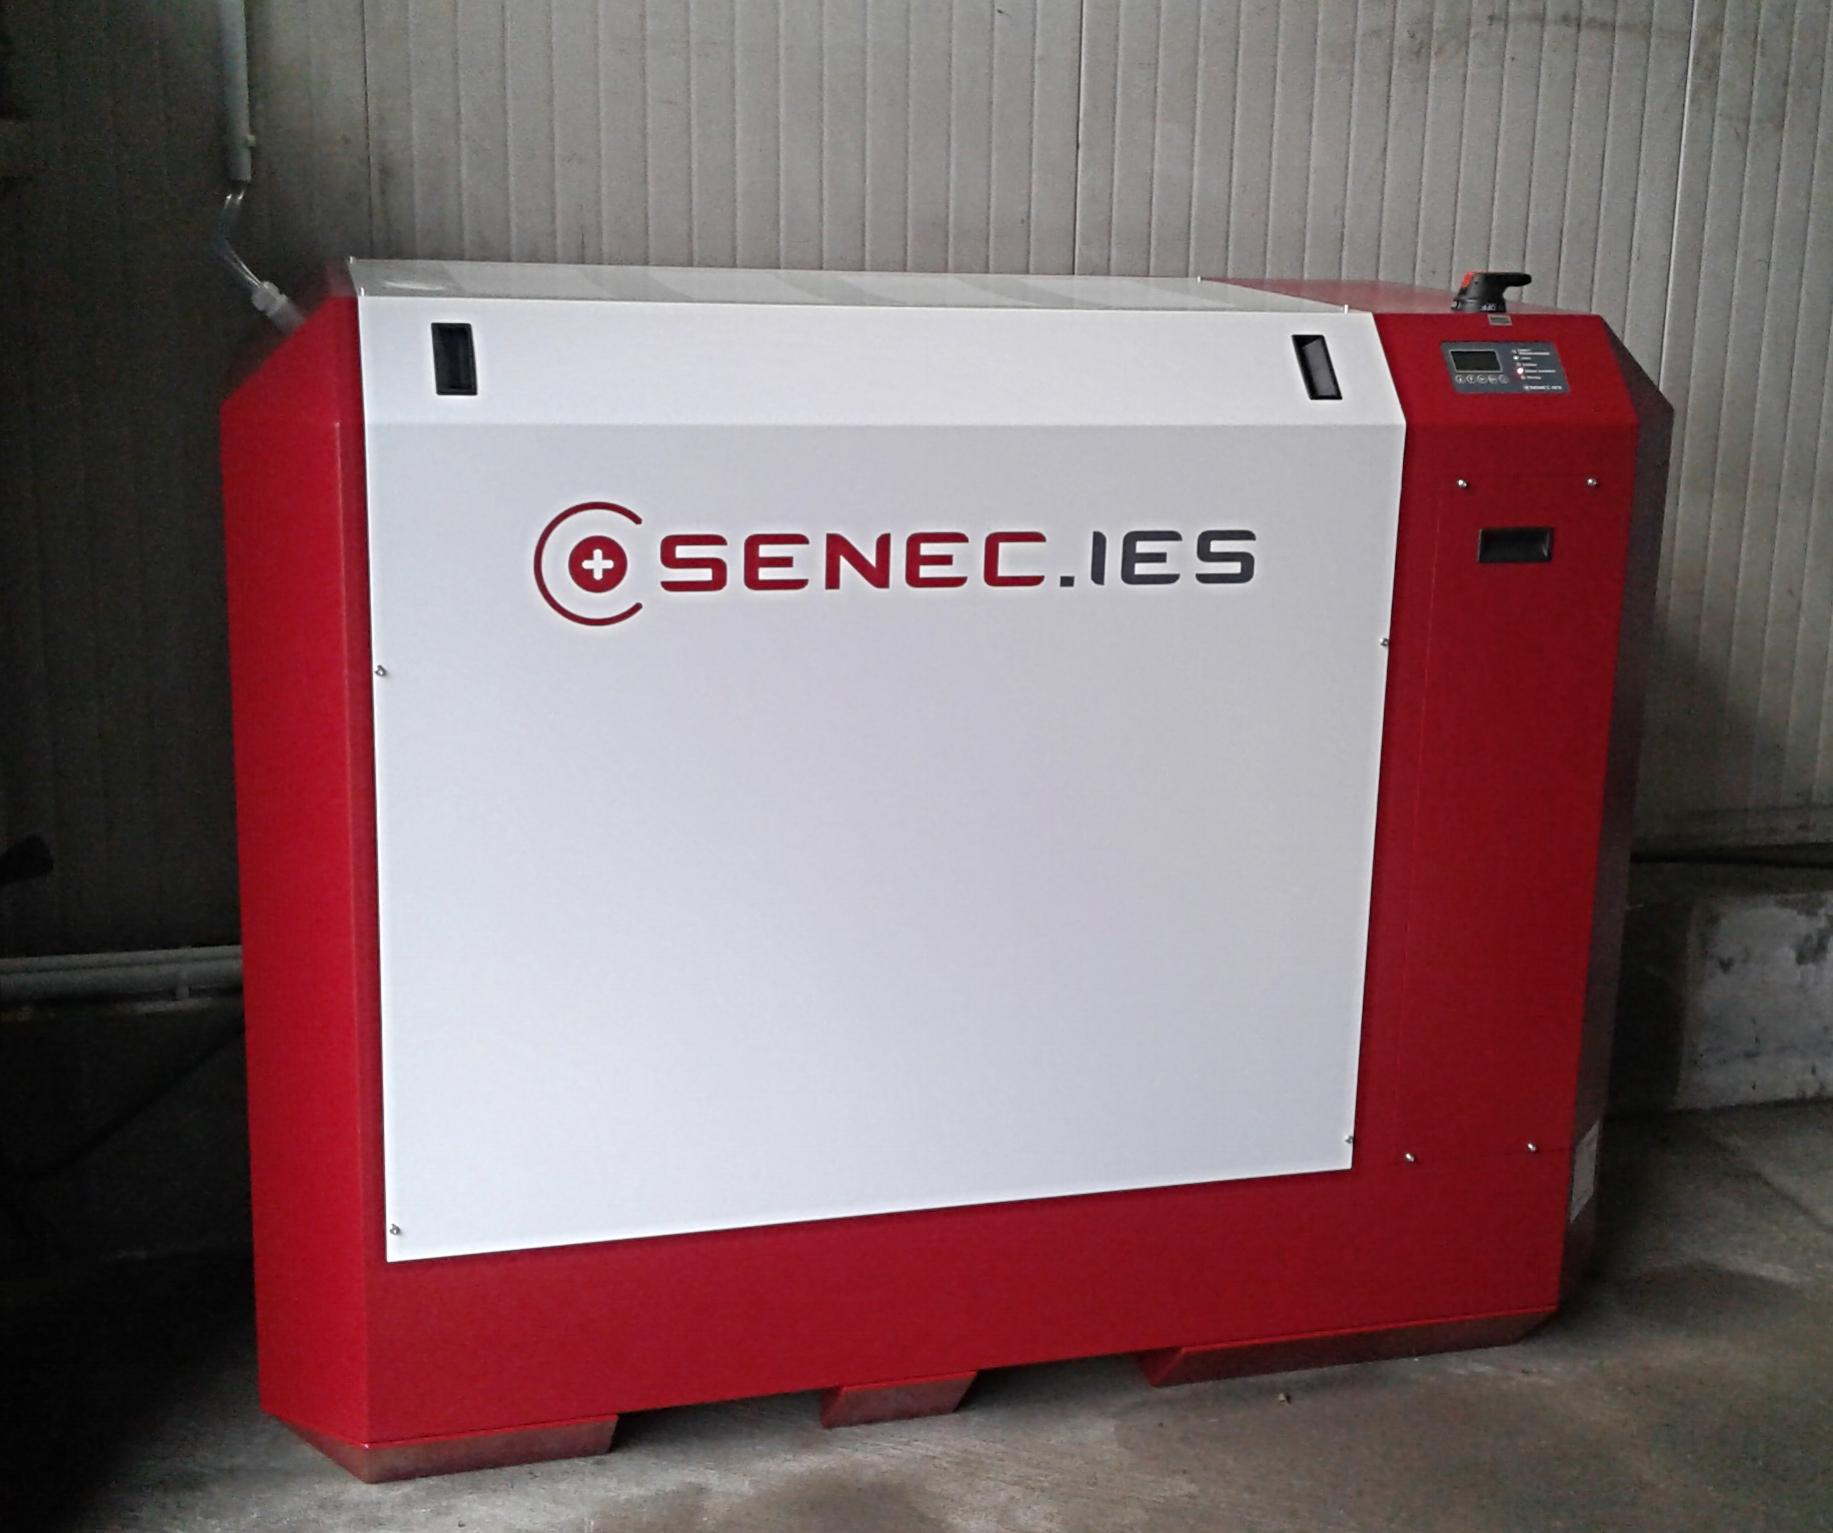 30 kWh Pb SENEC.IES Business Speicher mit Senec.Cloud für DOCO Fahrzeugtechnik GmbH in Panketal